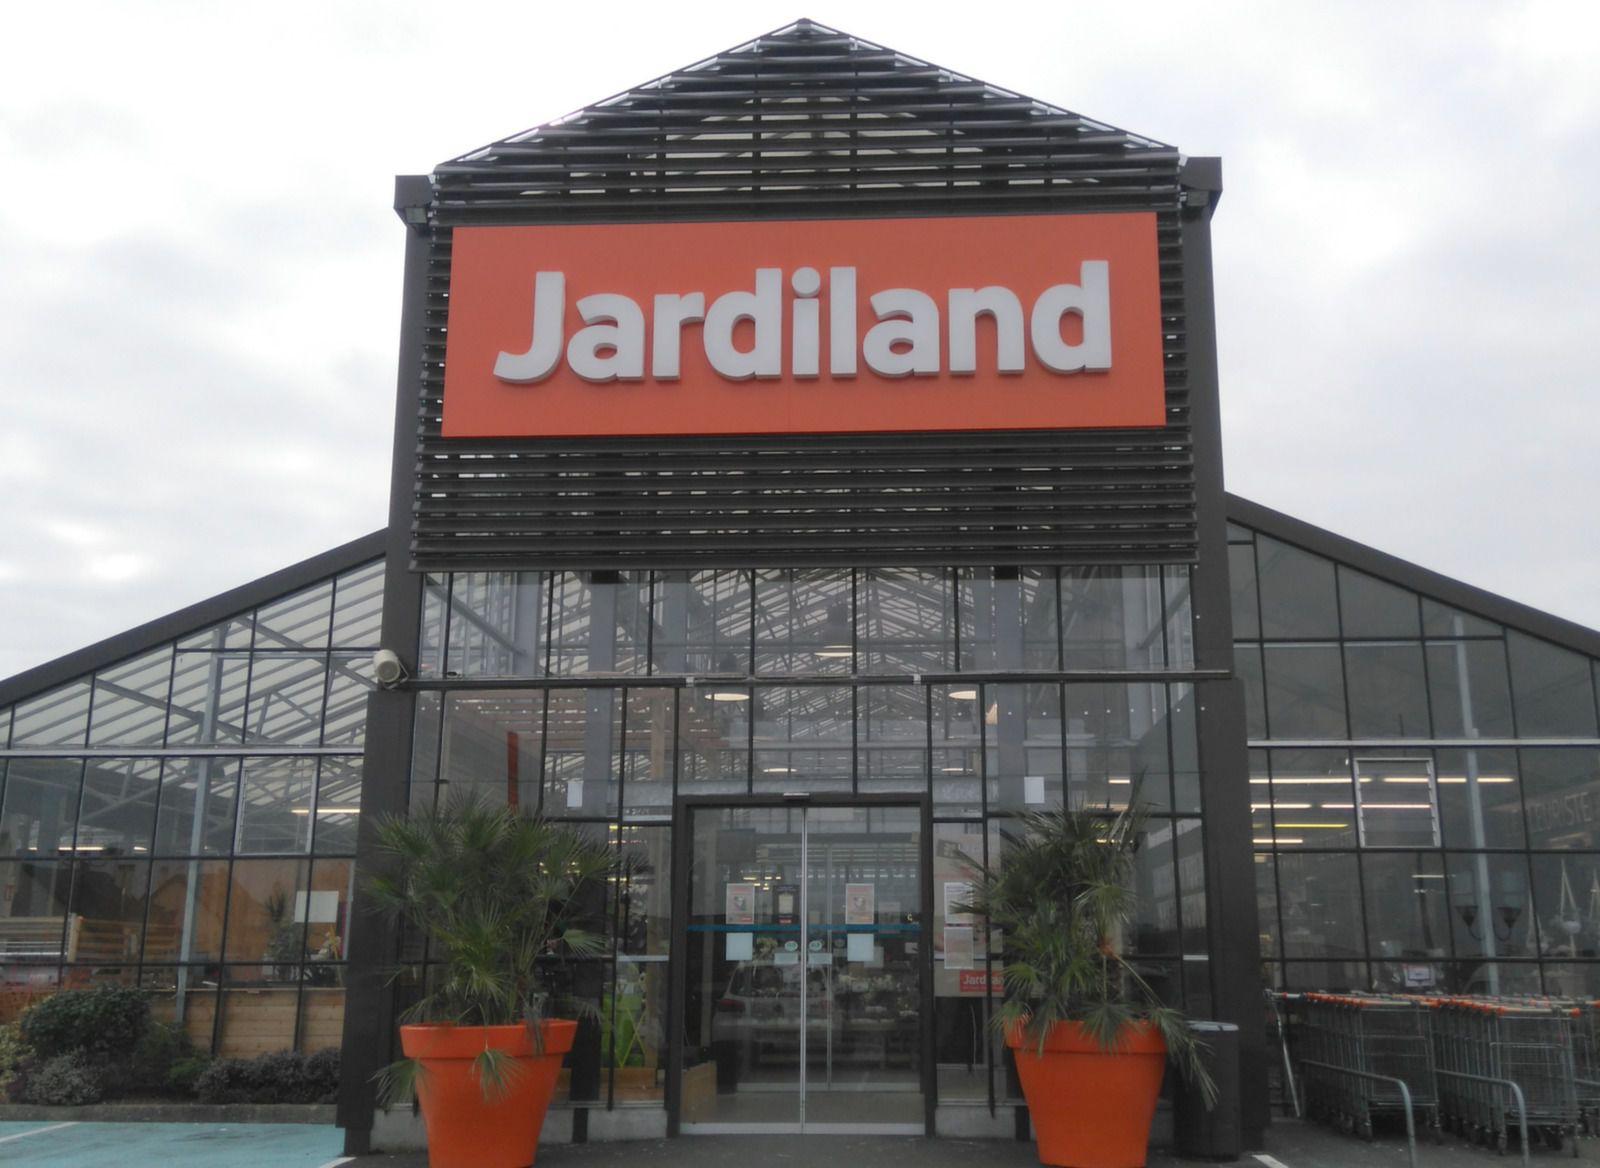 Jardiland Granville - Granville - Manche encequiconcerne Tonnelle De Jardin Jardiland